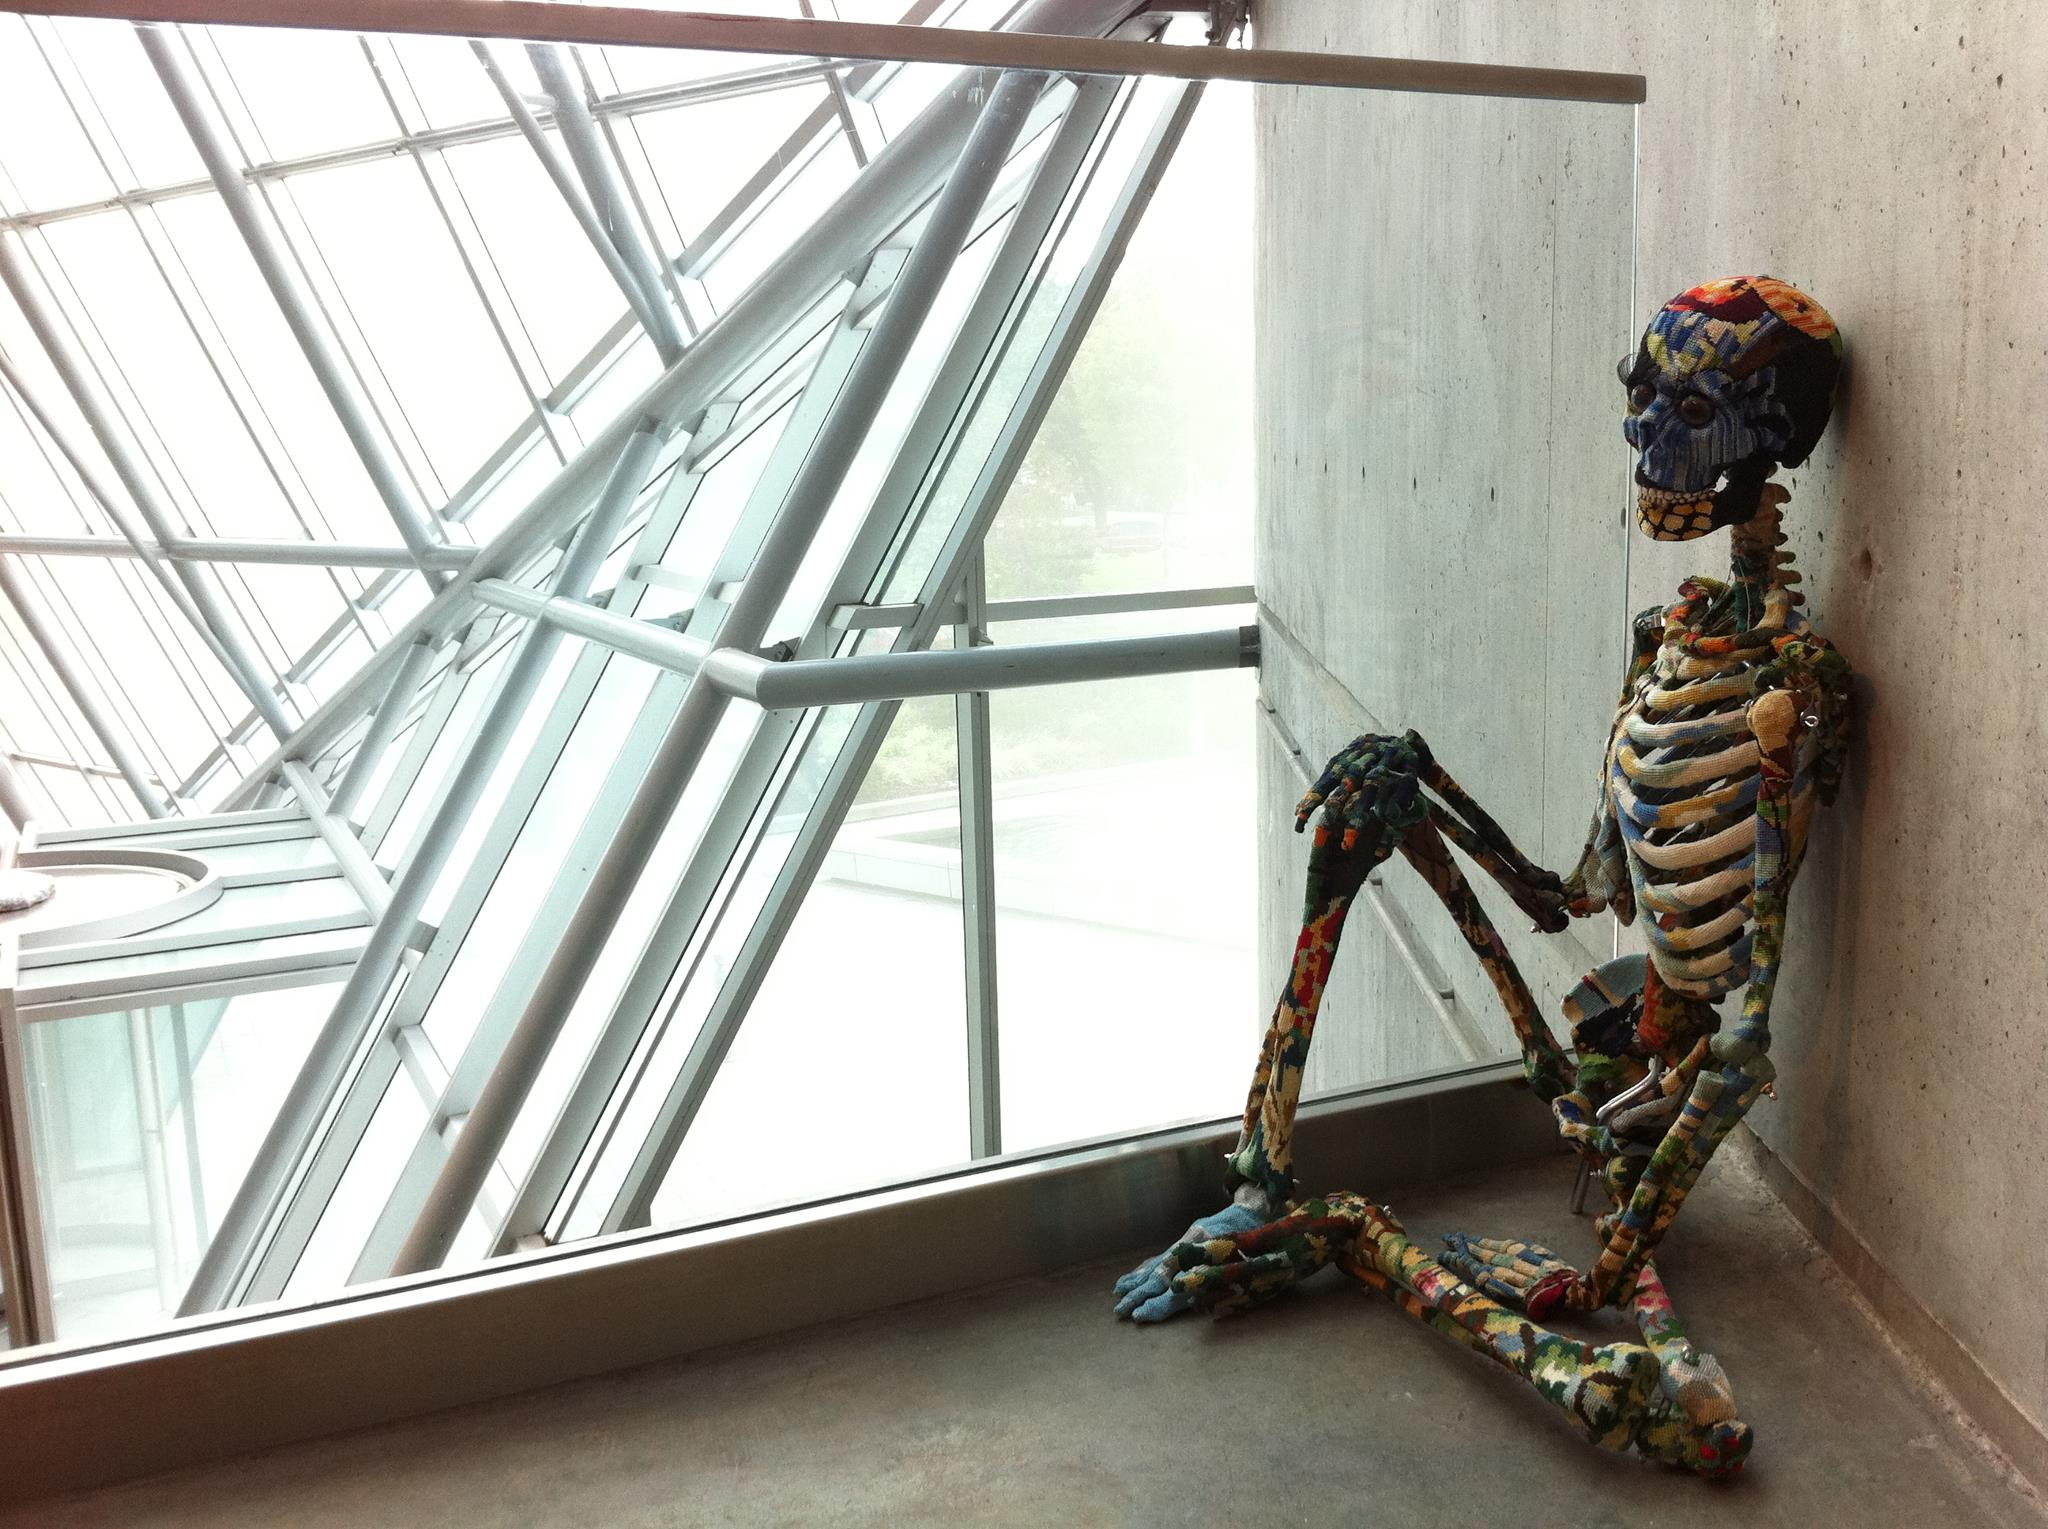 Frédérique Morrel – Waiting for the spark of life